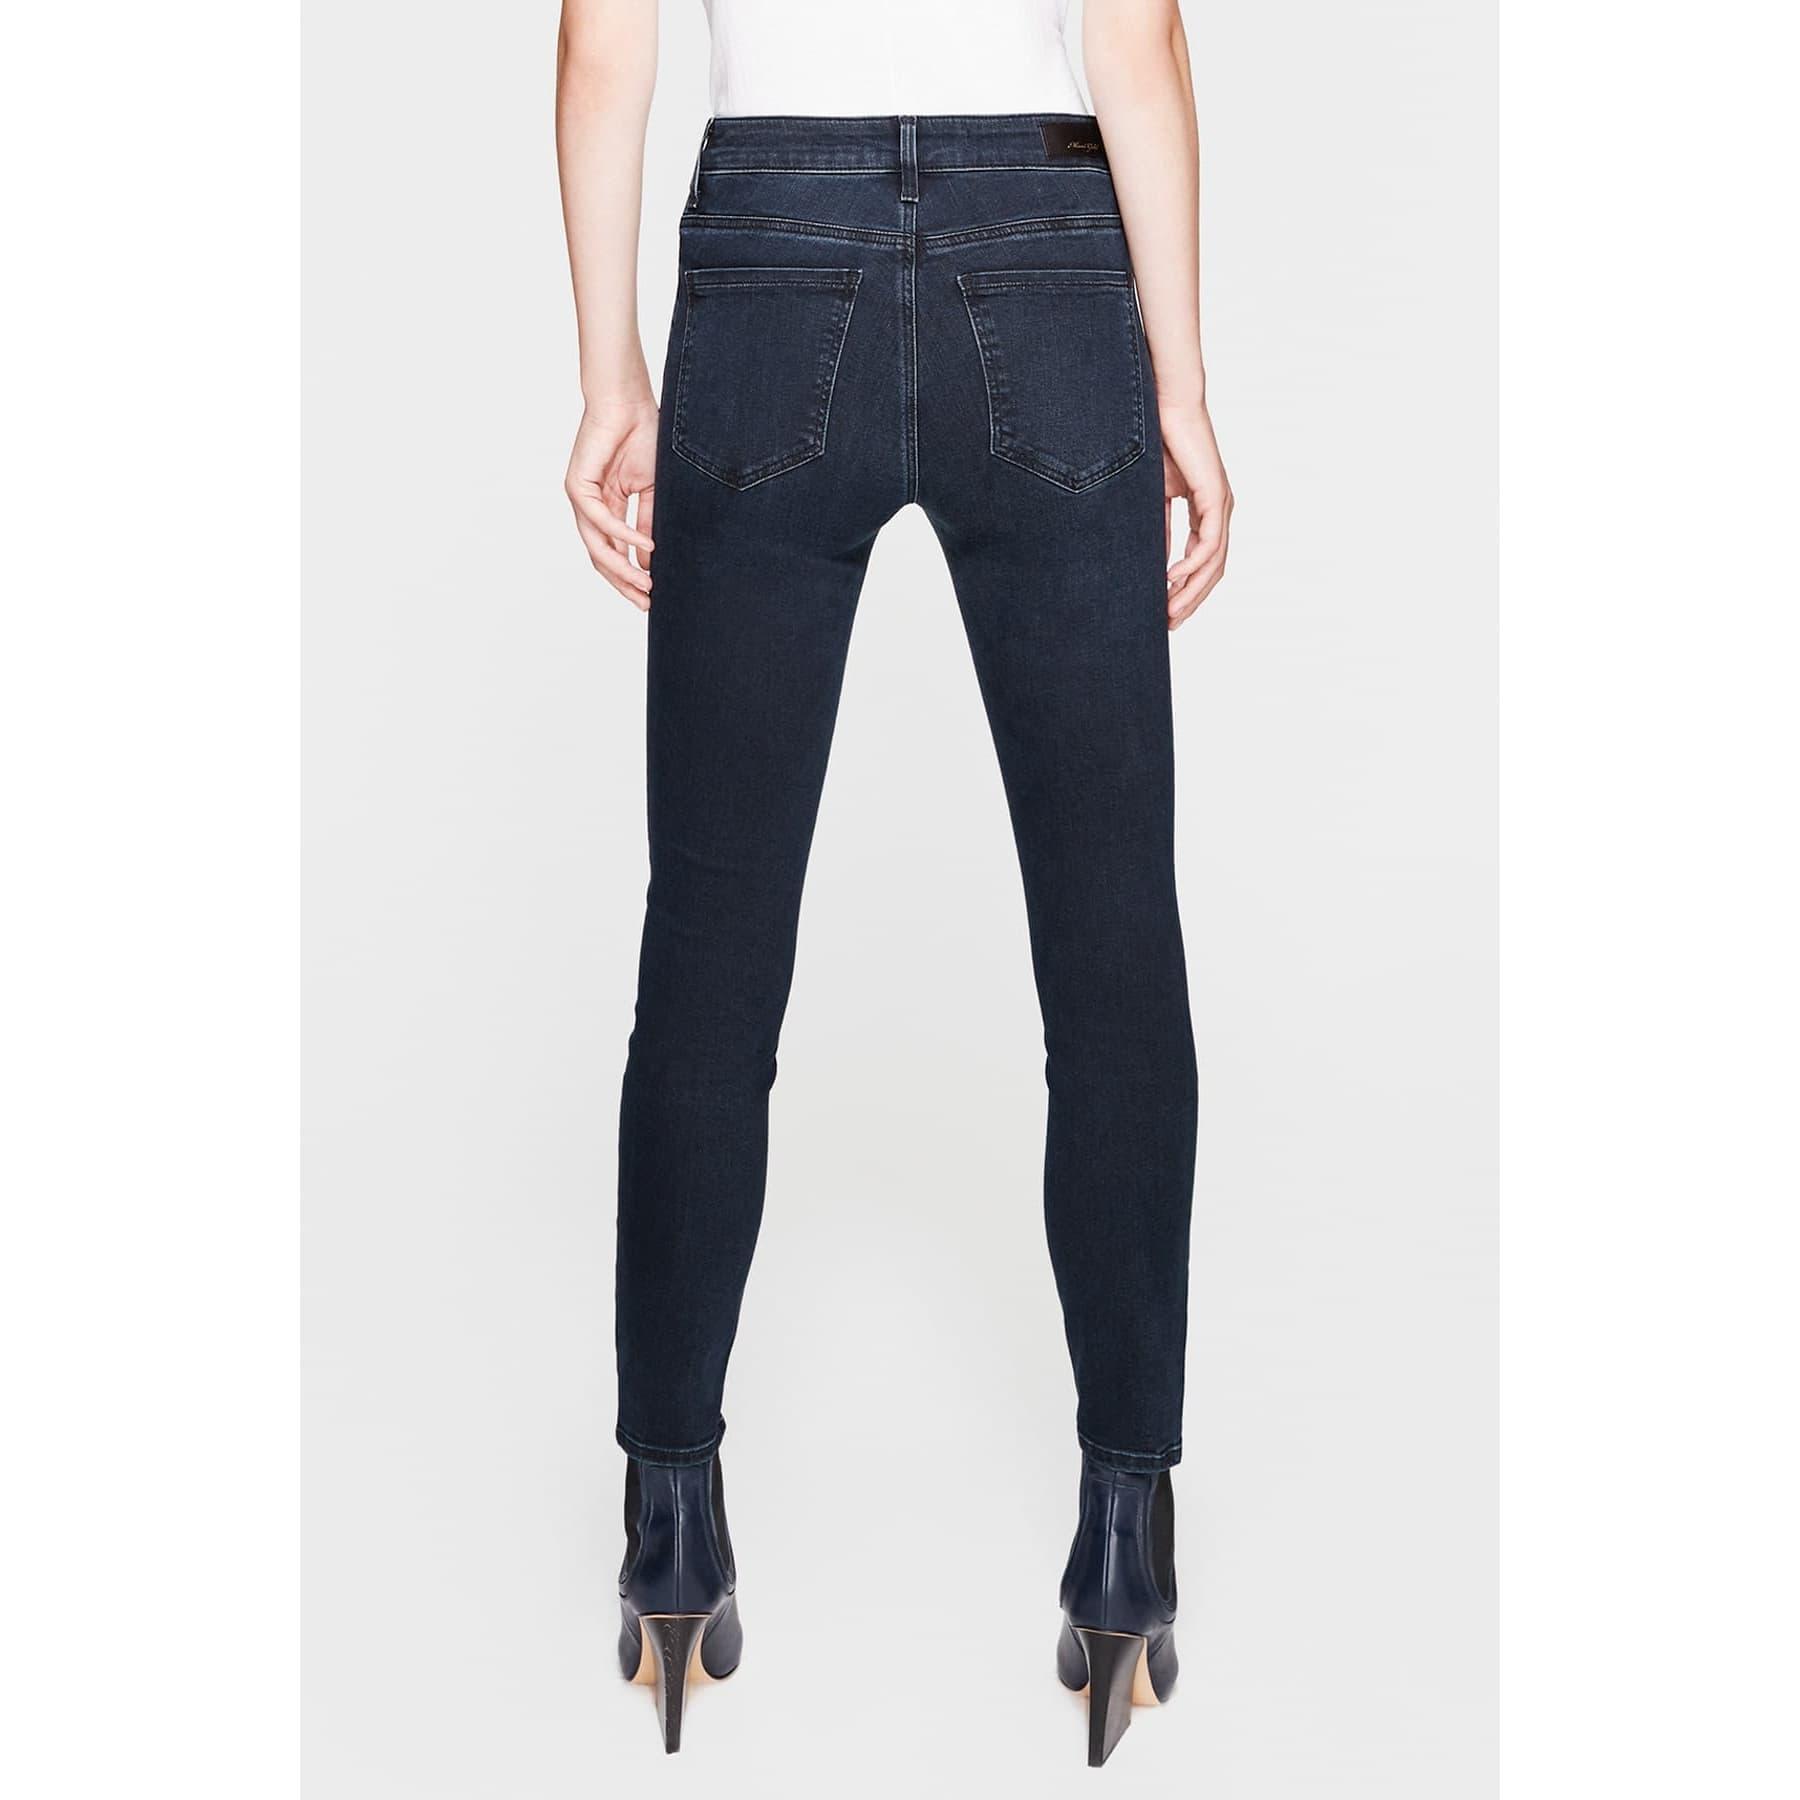 Tess Skinny Jean Kadın Lacivert Kot Pantolon